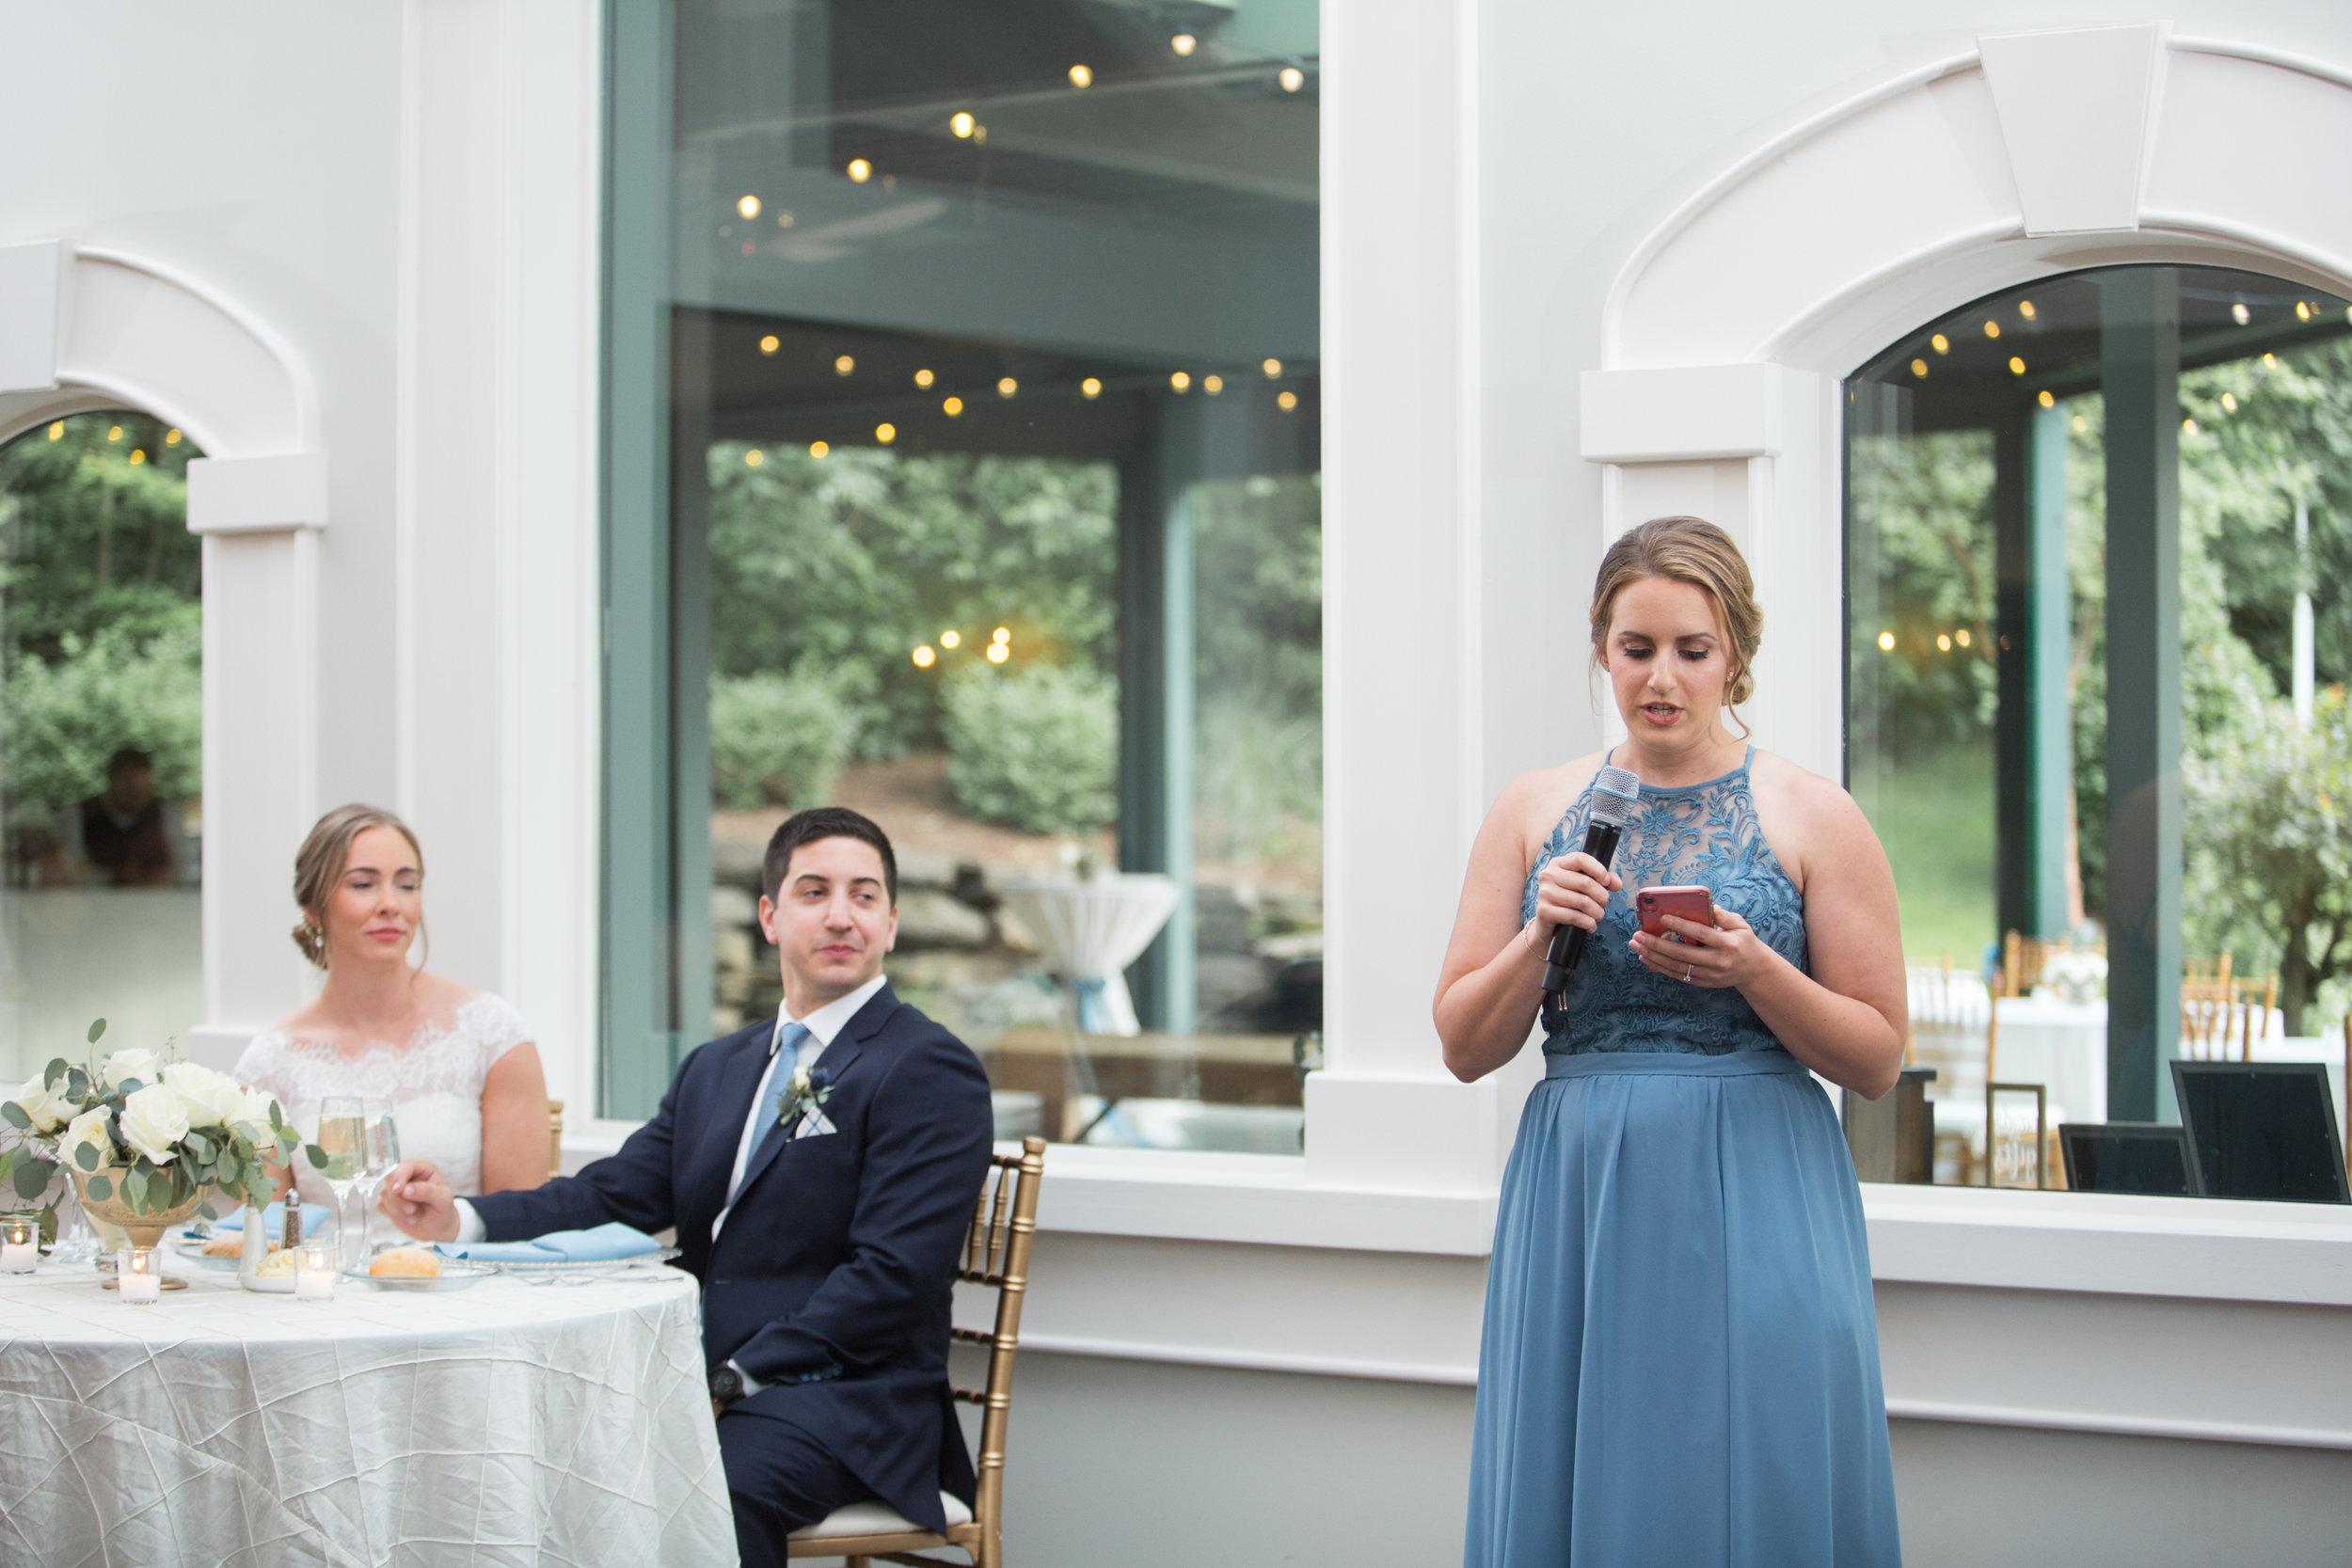 Constantino's Catering Event Venue Wedding Photos-146.jpg